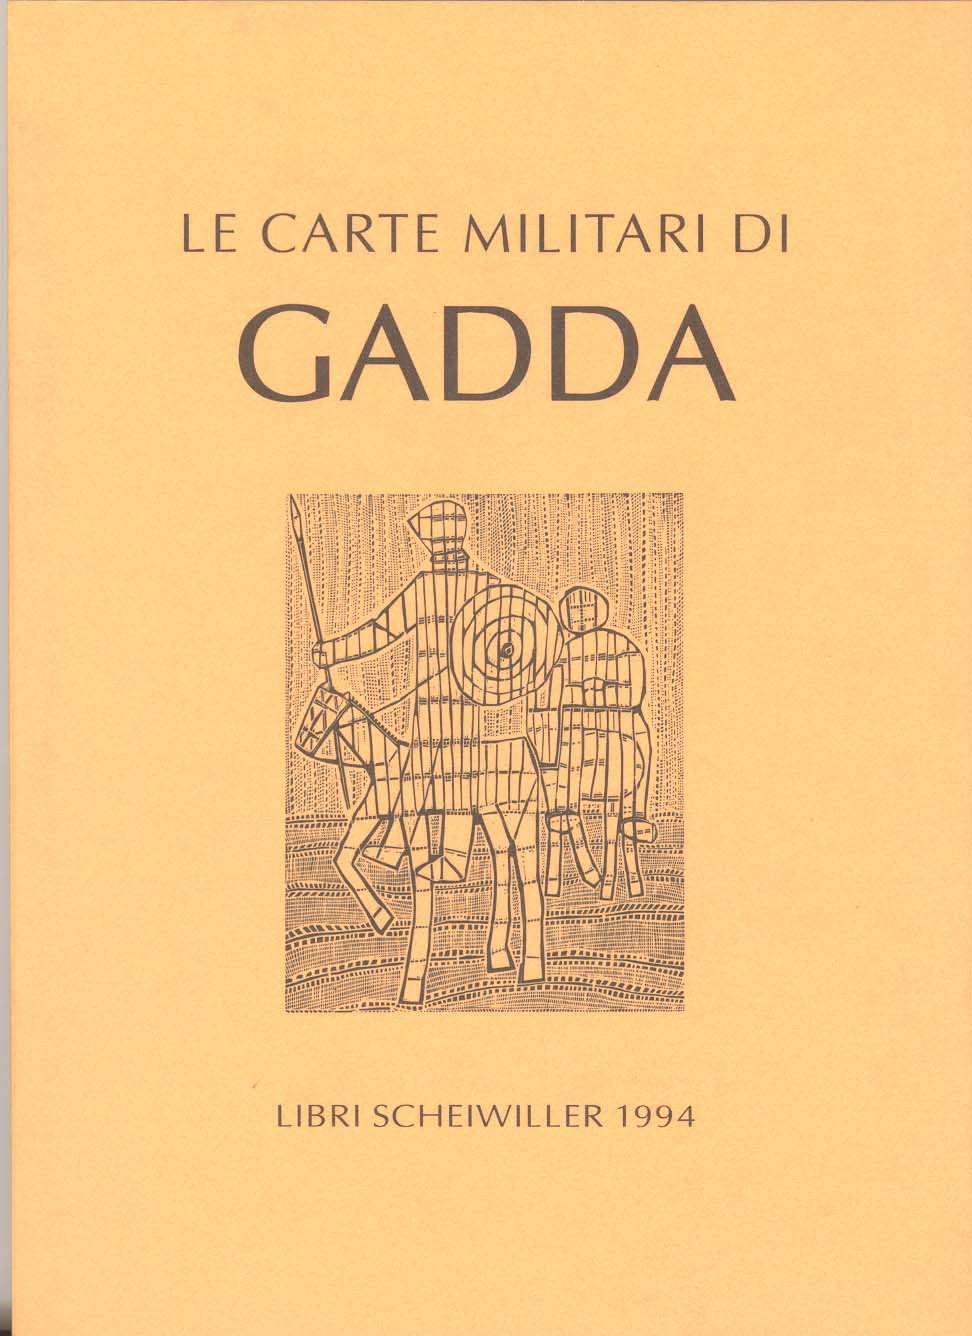 Le carte militari di Gadda